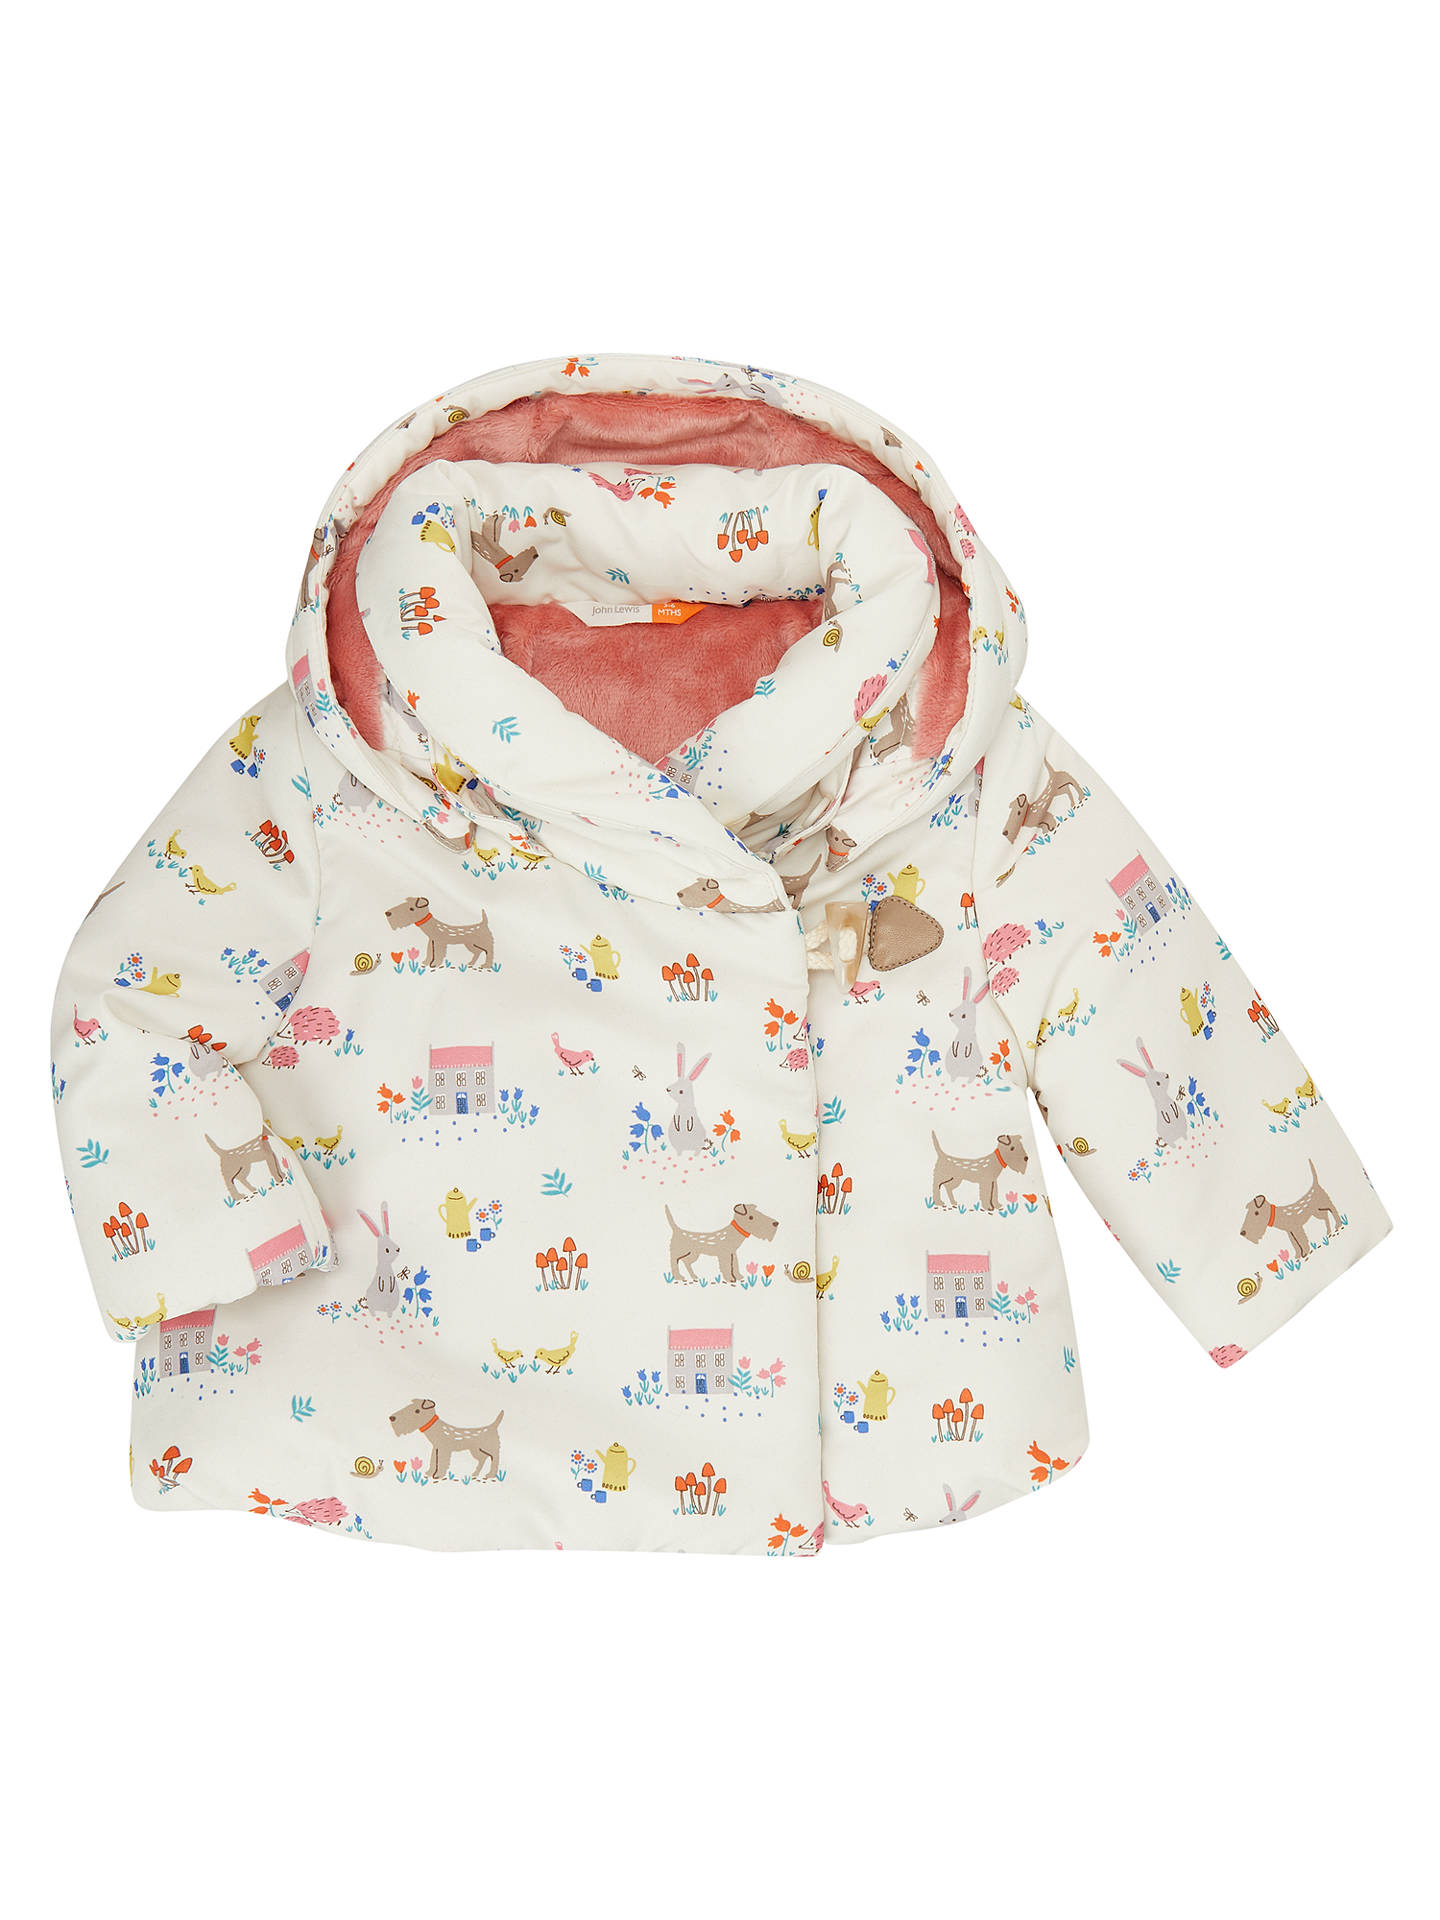 bafcdbc65c26 John Lewis Baby Leckford Animal Print Hooded Coat